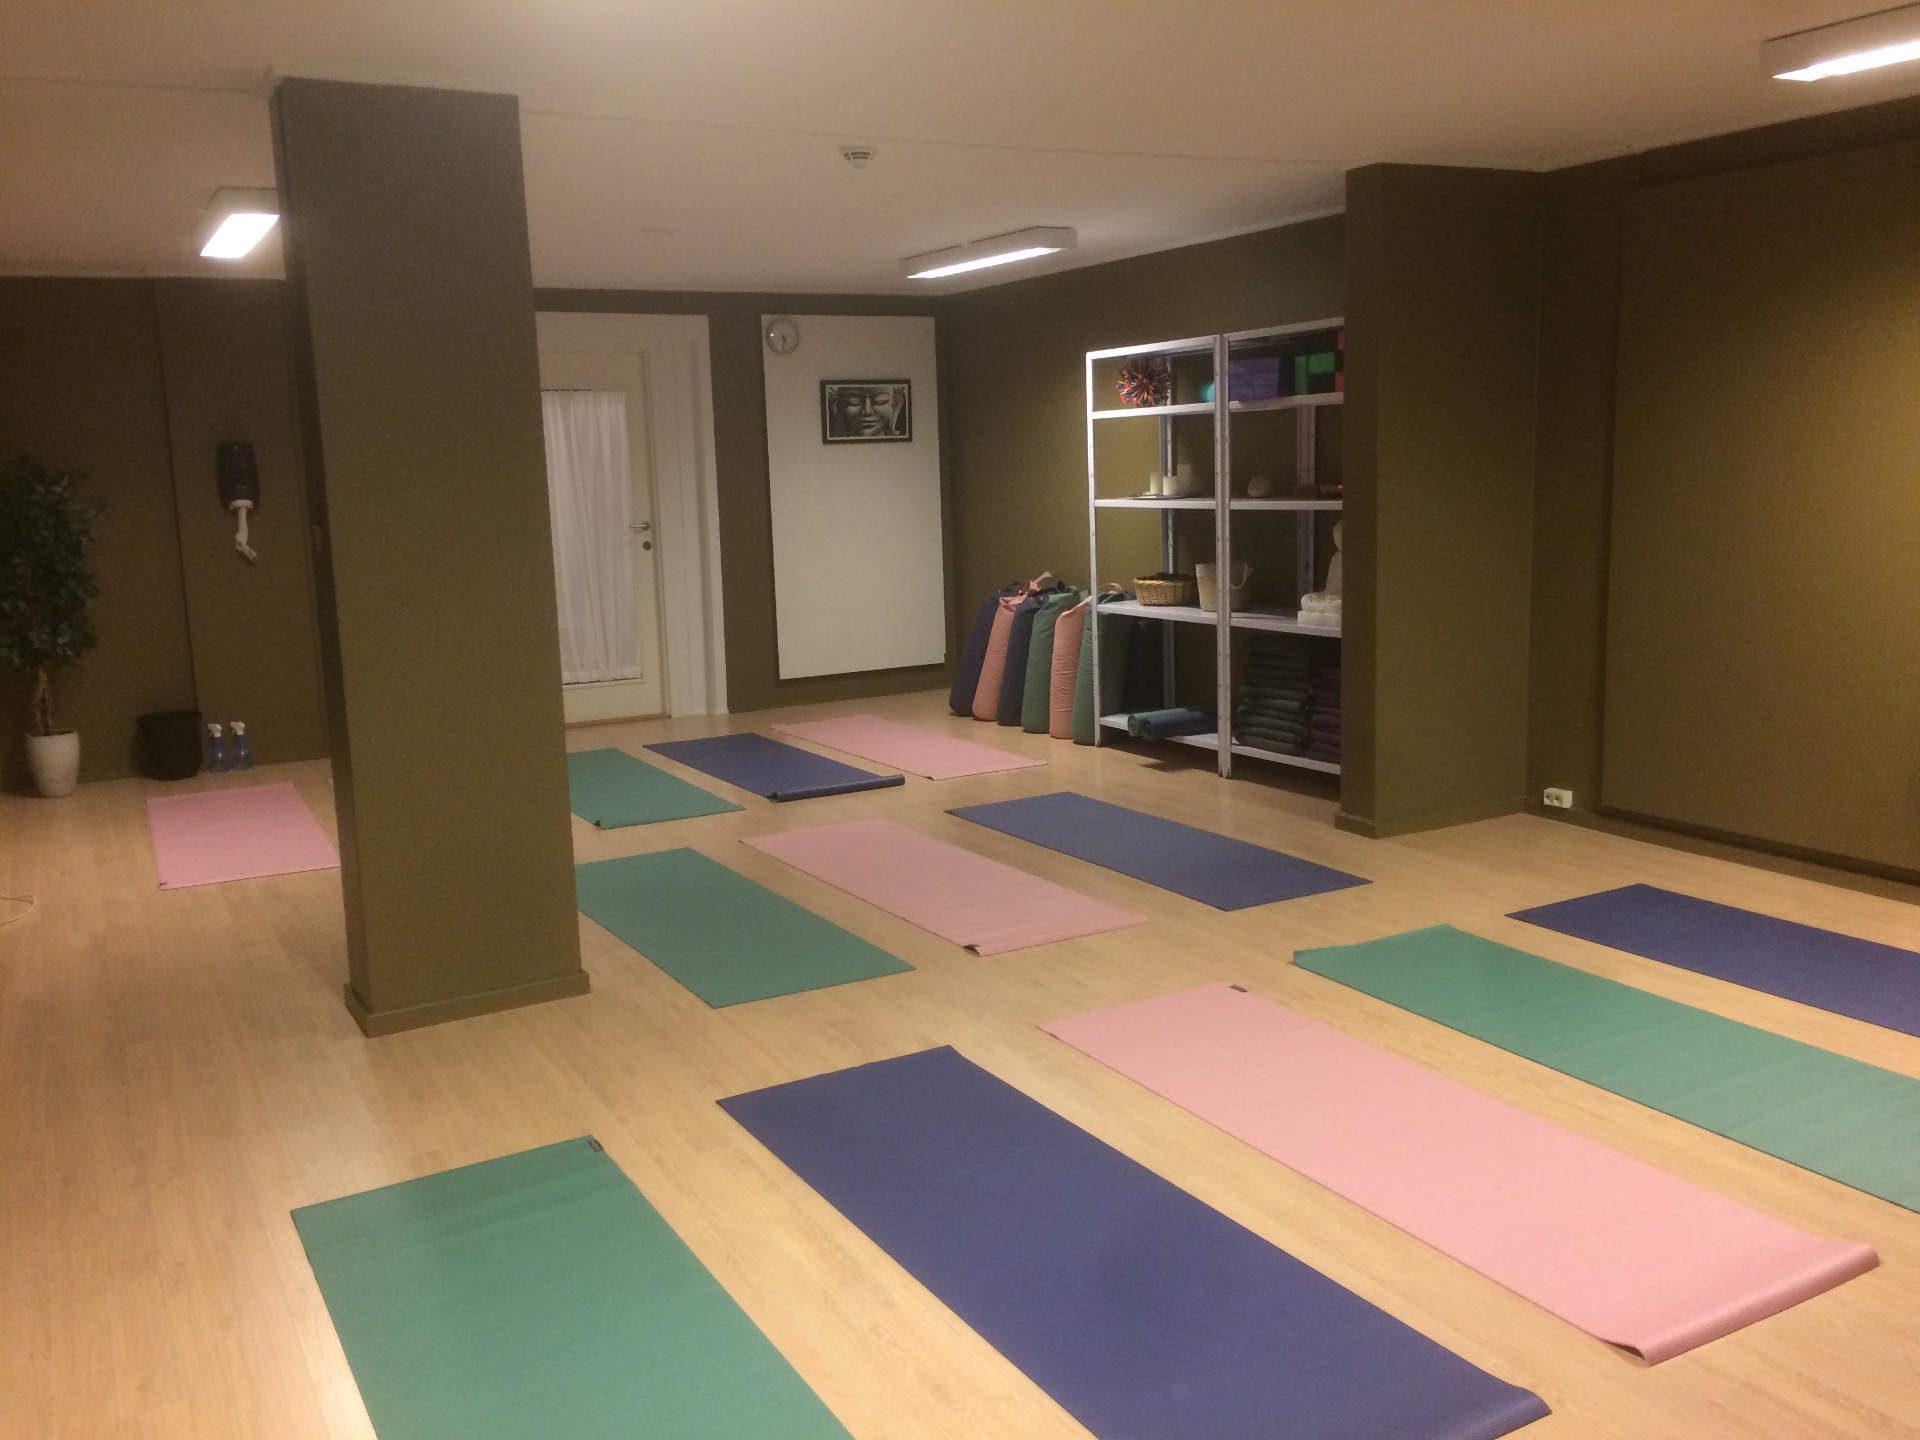 Gaia Yoga Tønsberg har fått nye lokaler